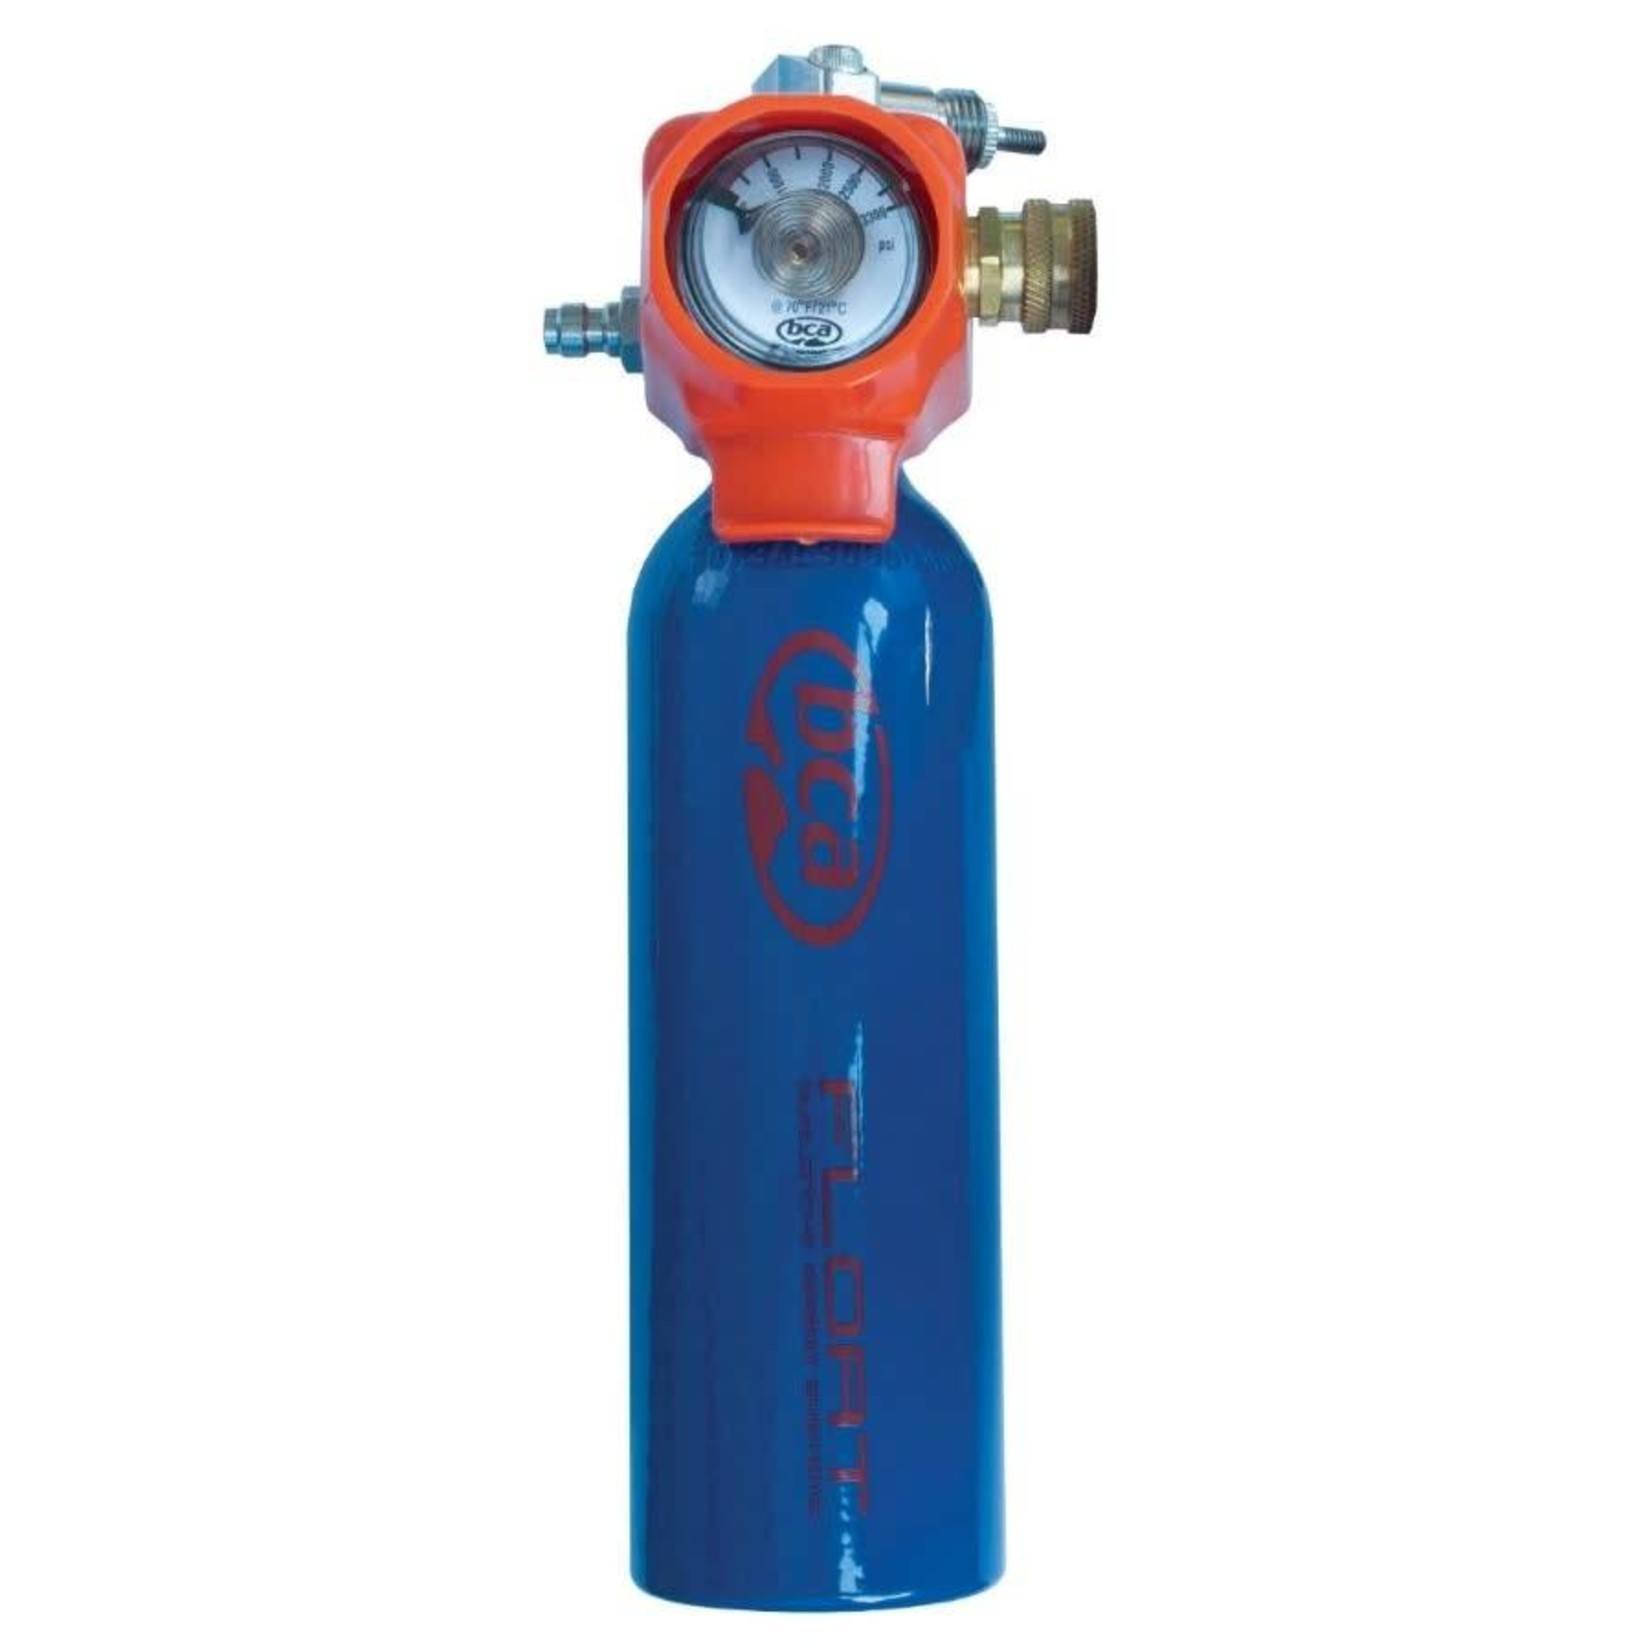 Backcountry Access Cylindre d'air comprimé BCA Float 2.0